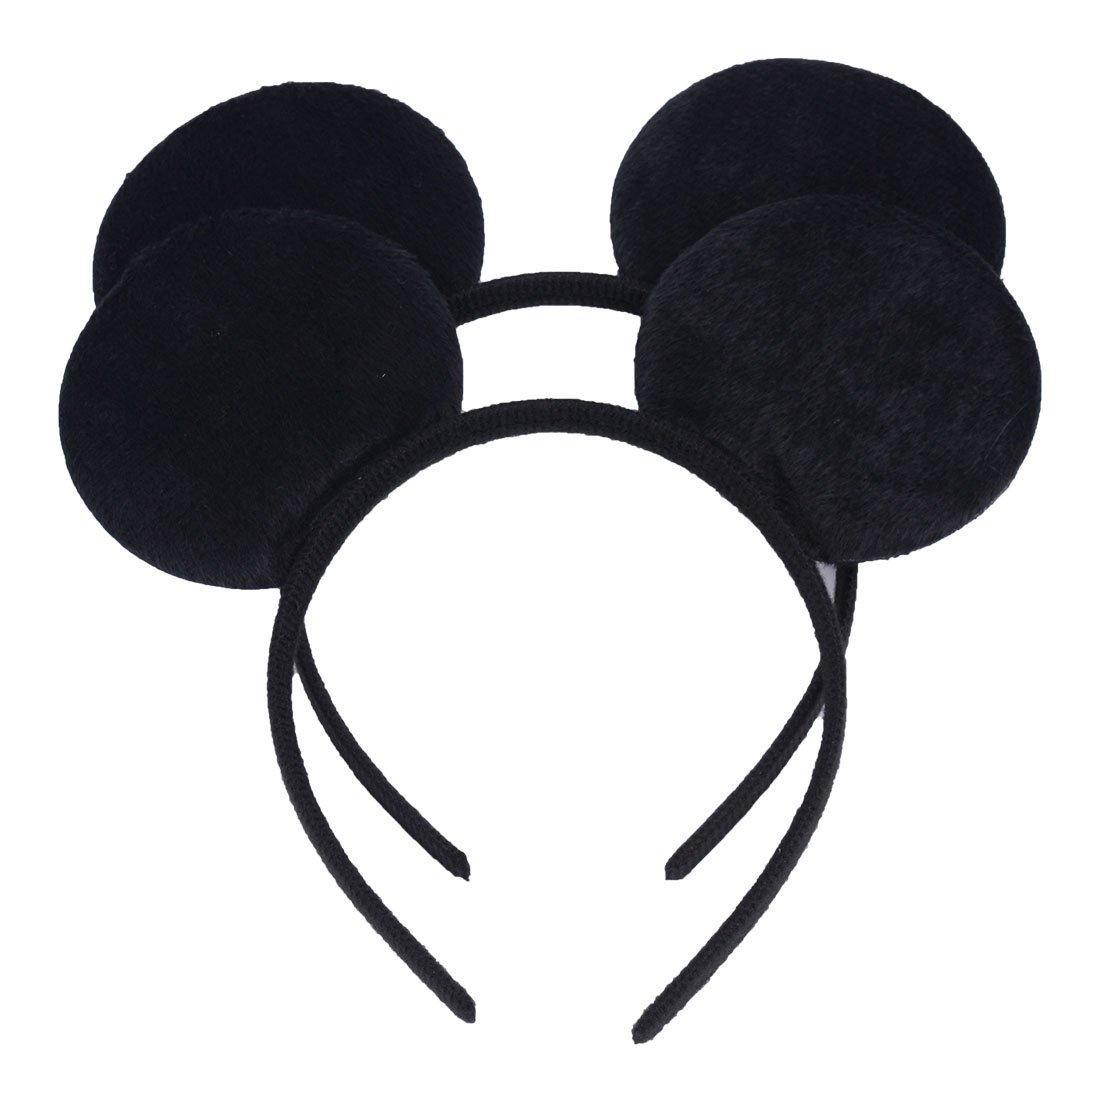 Warrior Princess and mushu Dragon Mouse Ears style Headband